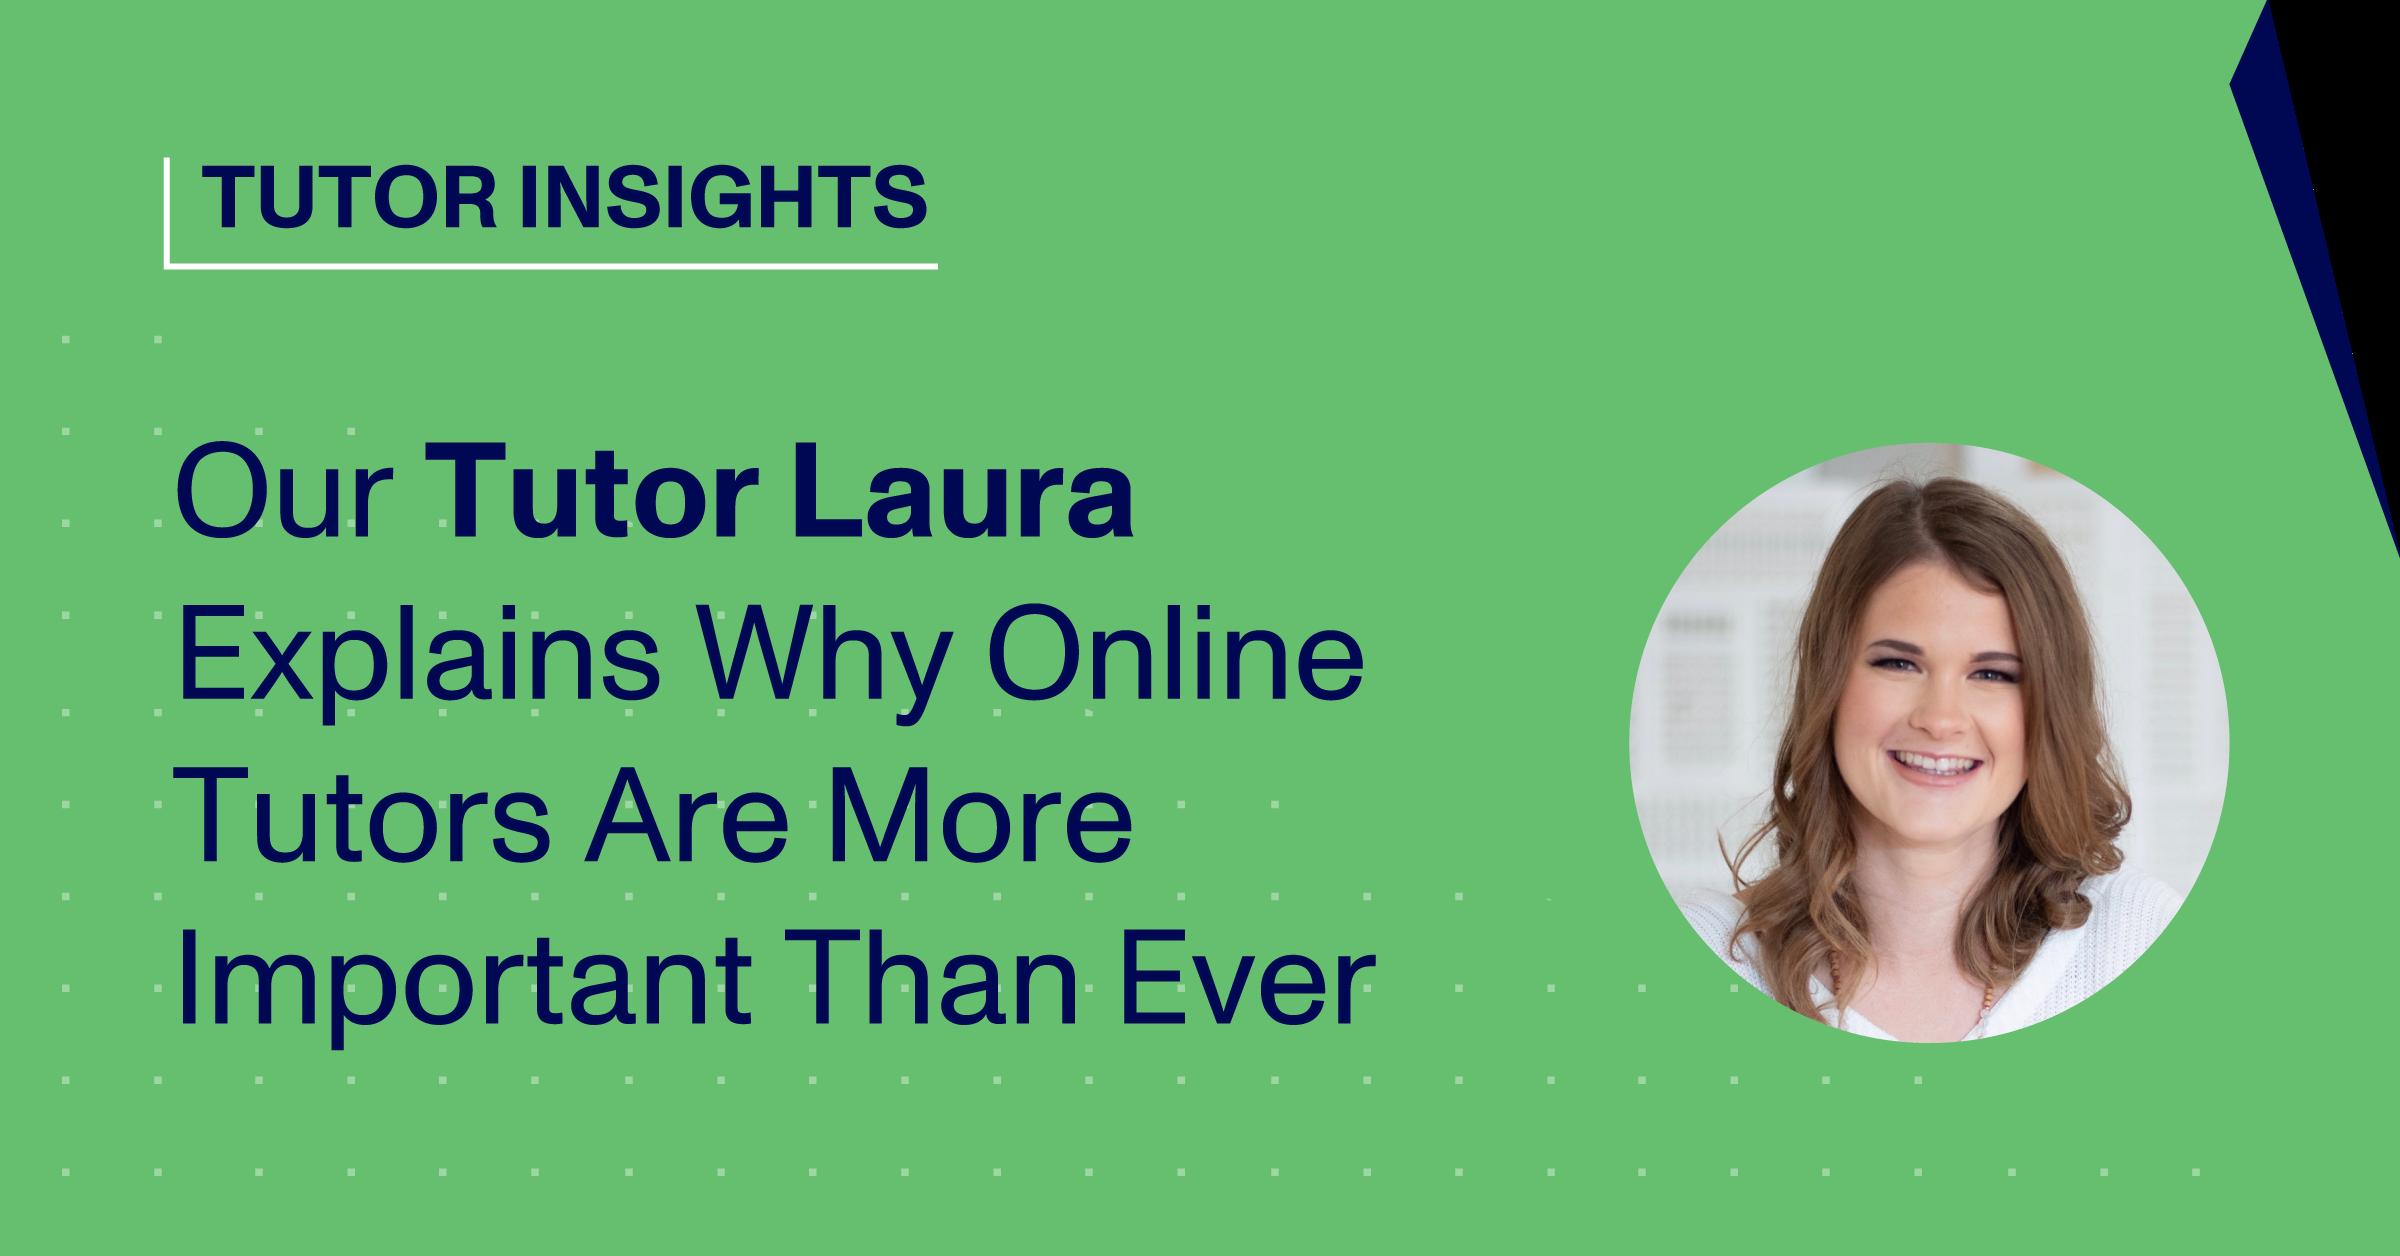 Blog Thumbnail with Headshot of Tutor Laura